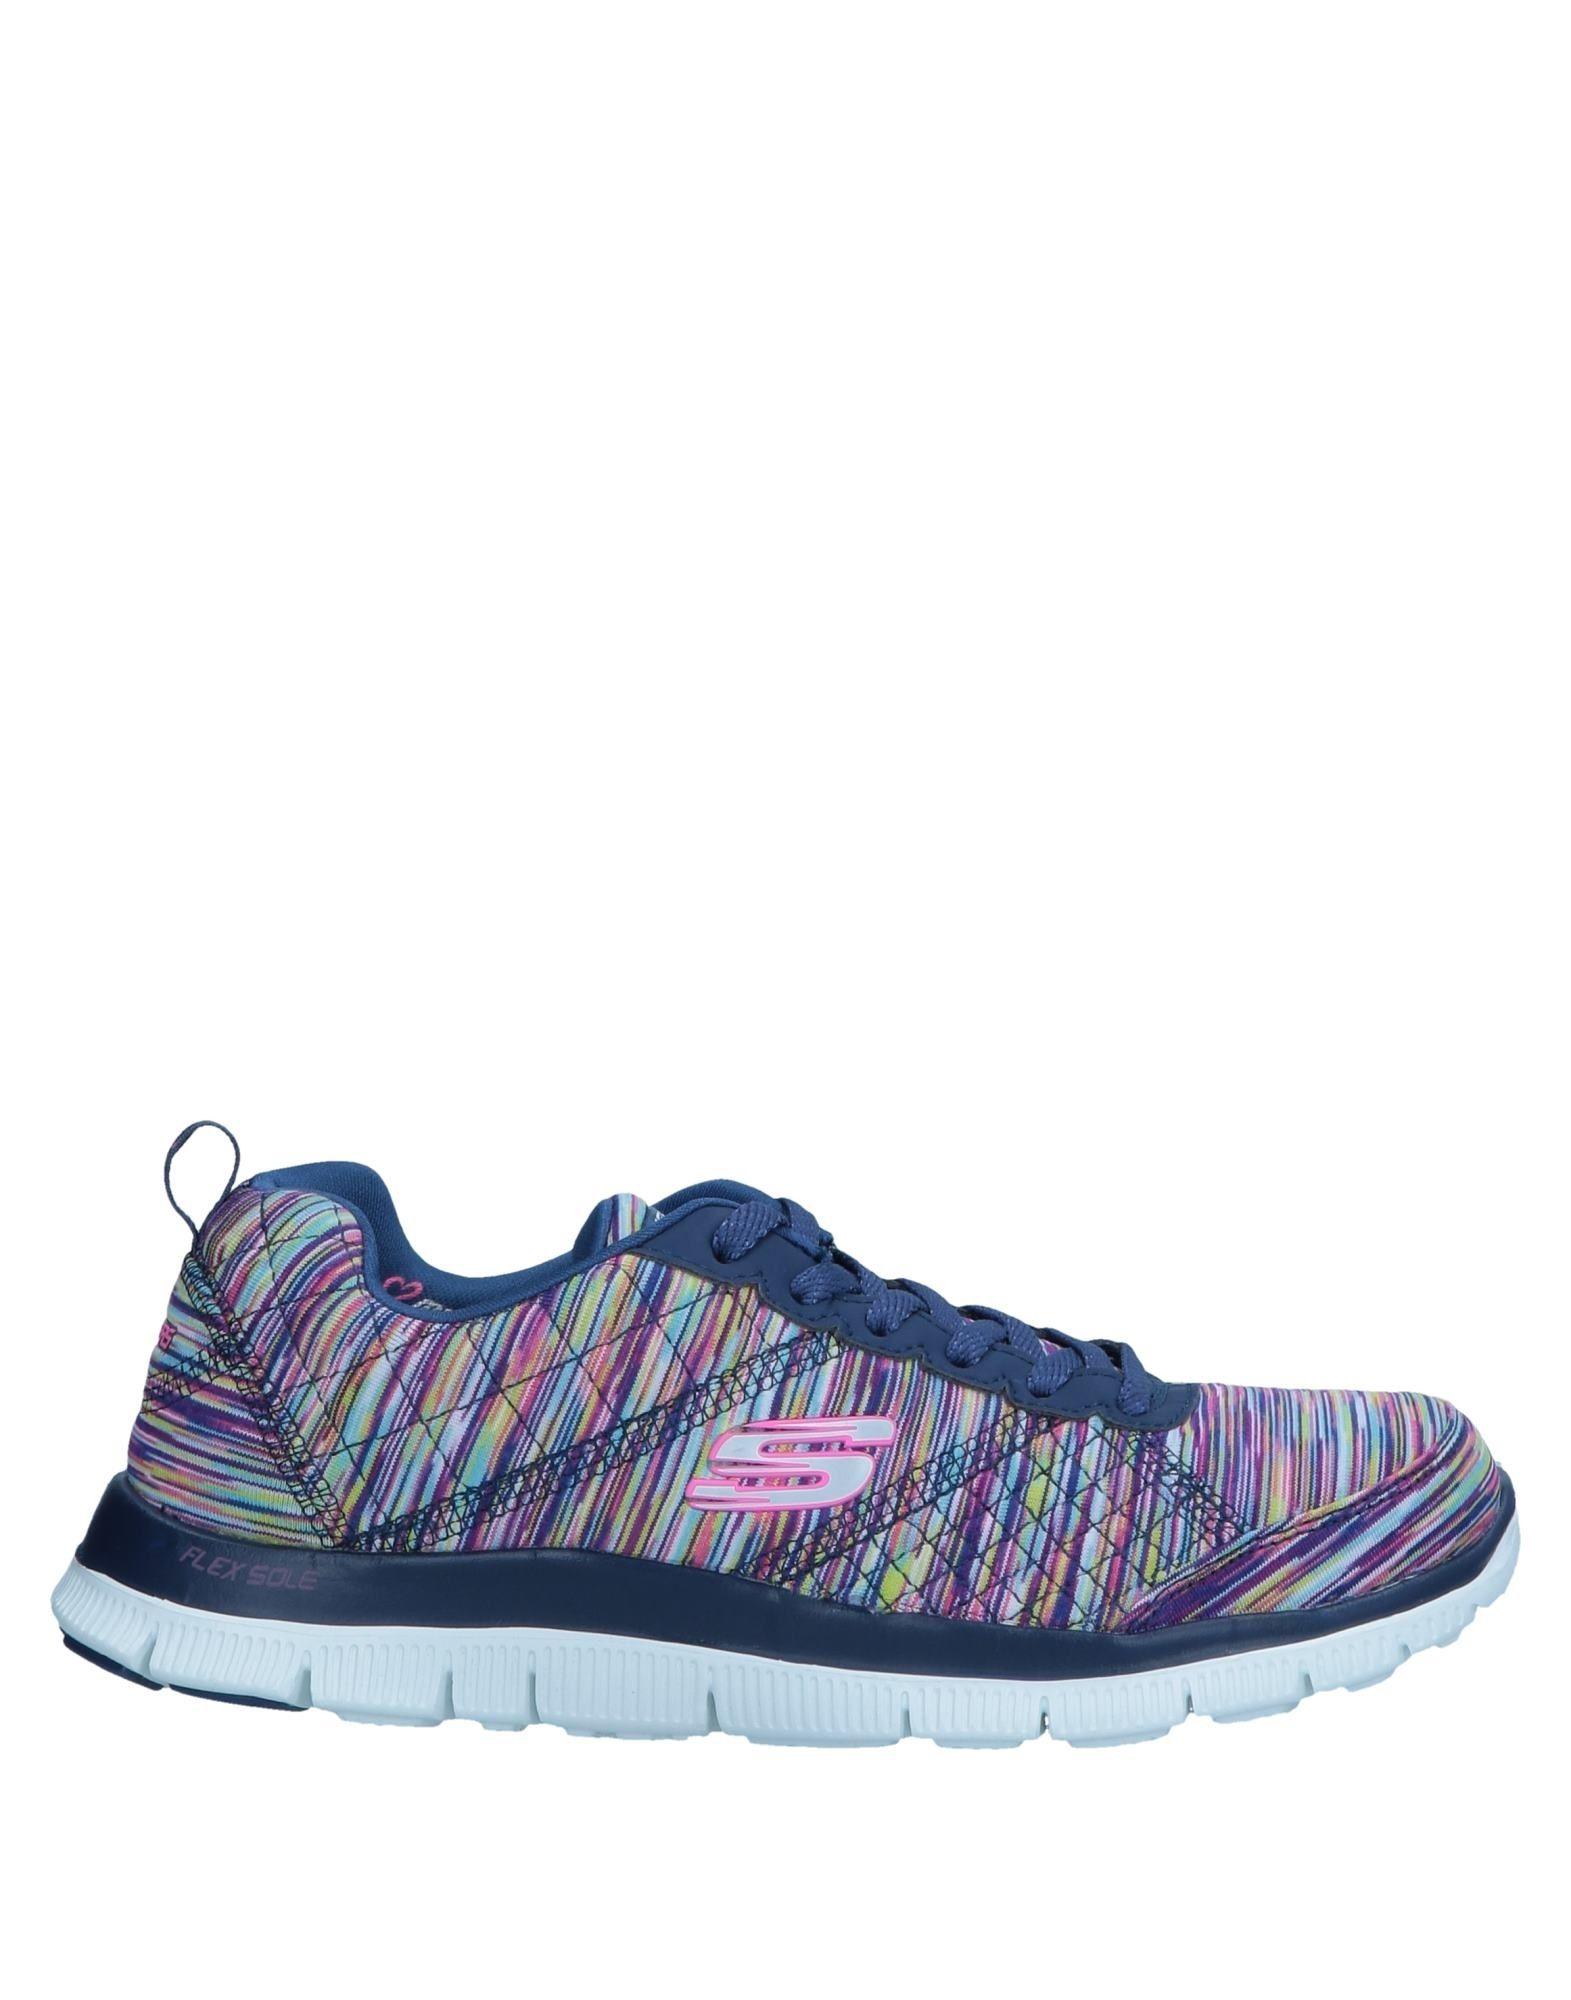 Skechers Sneakers - Women Skechers Sneakers - online on  Canada - Sneakers 11553831UE df1dfa